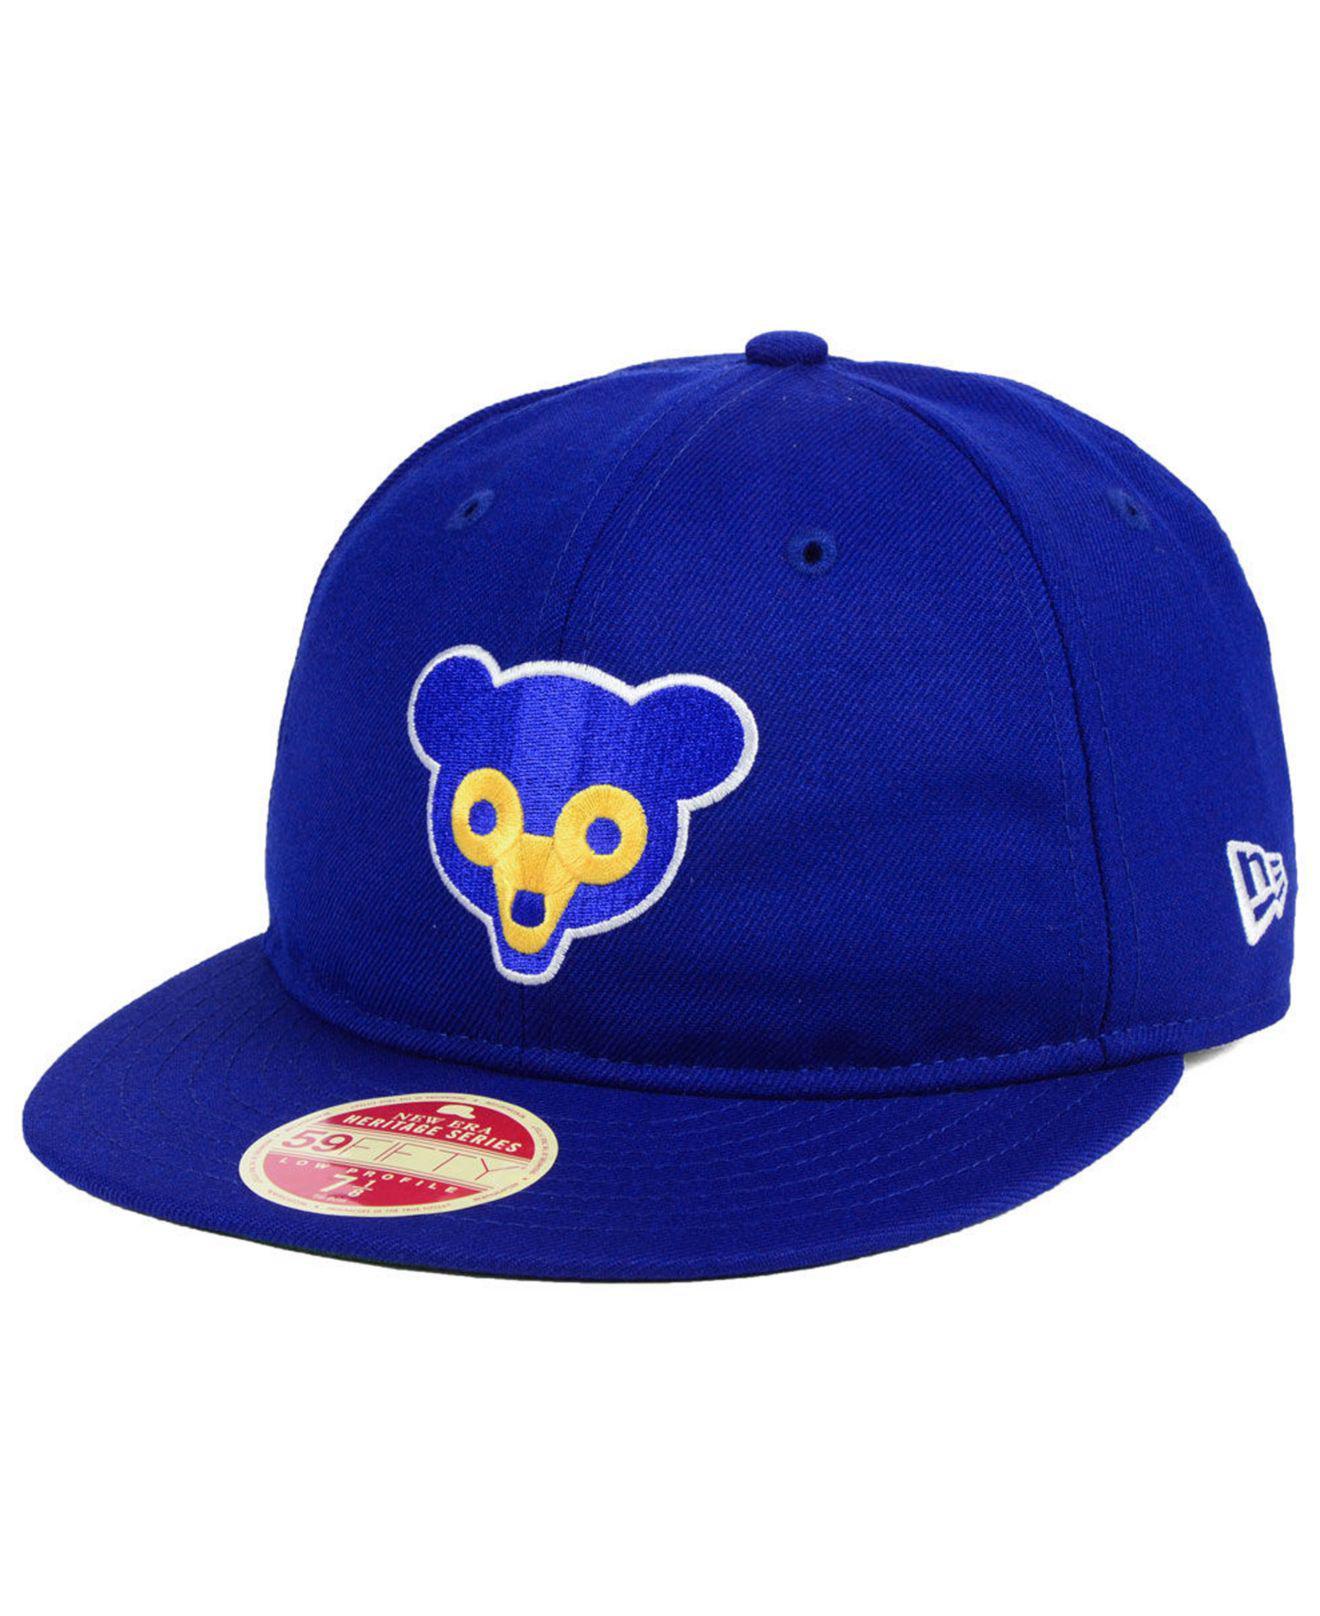 sale retailer 788fa e677f KTZ. Men s Blue Chicago Cubs Heritage Retro Classic 59fifty Fitted Cap